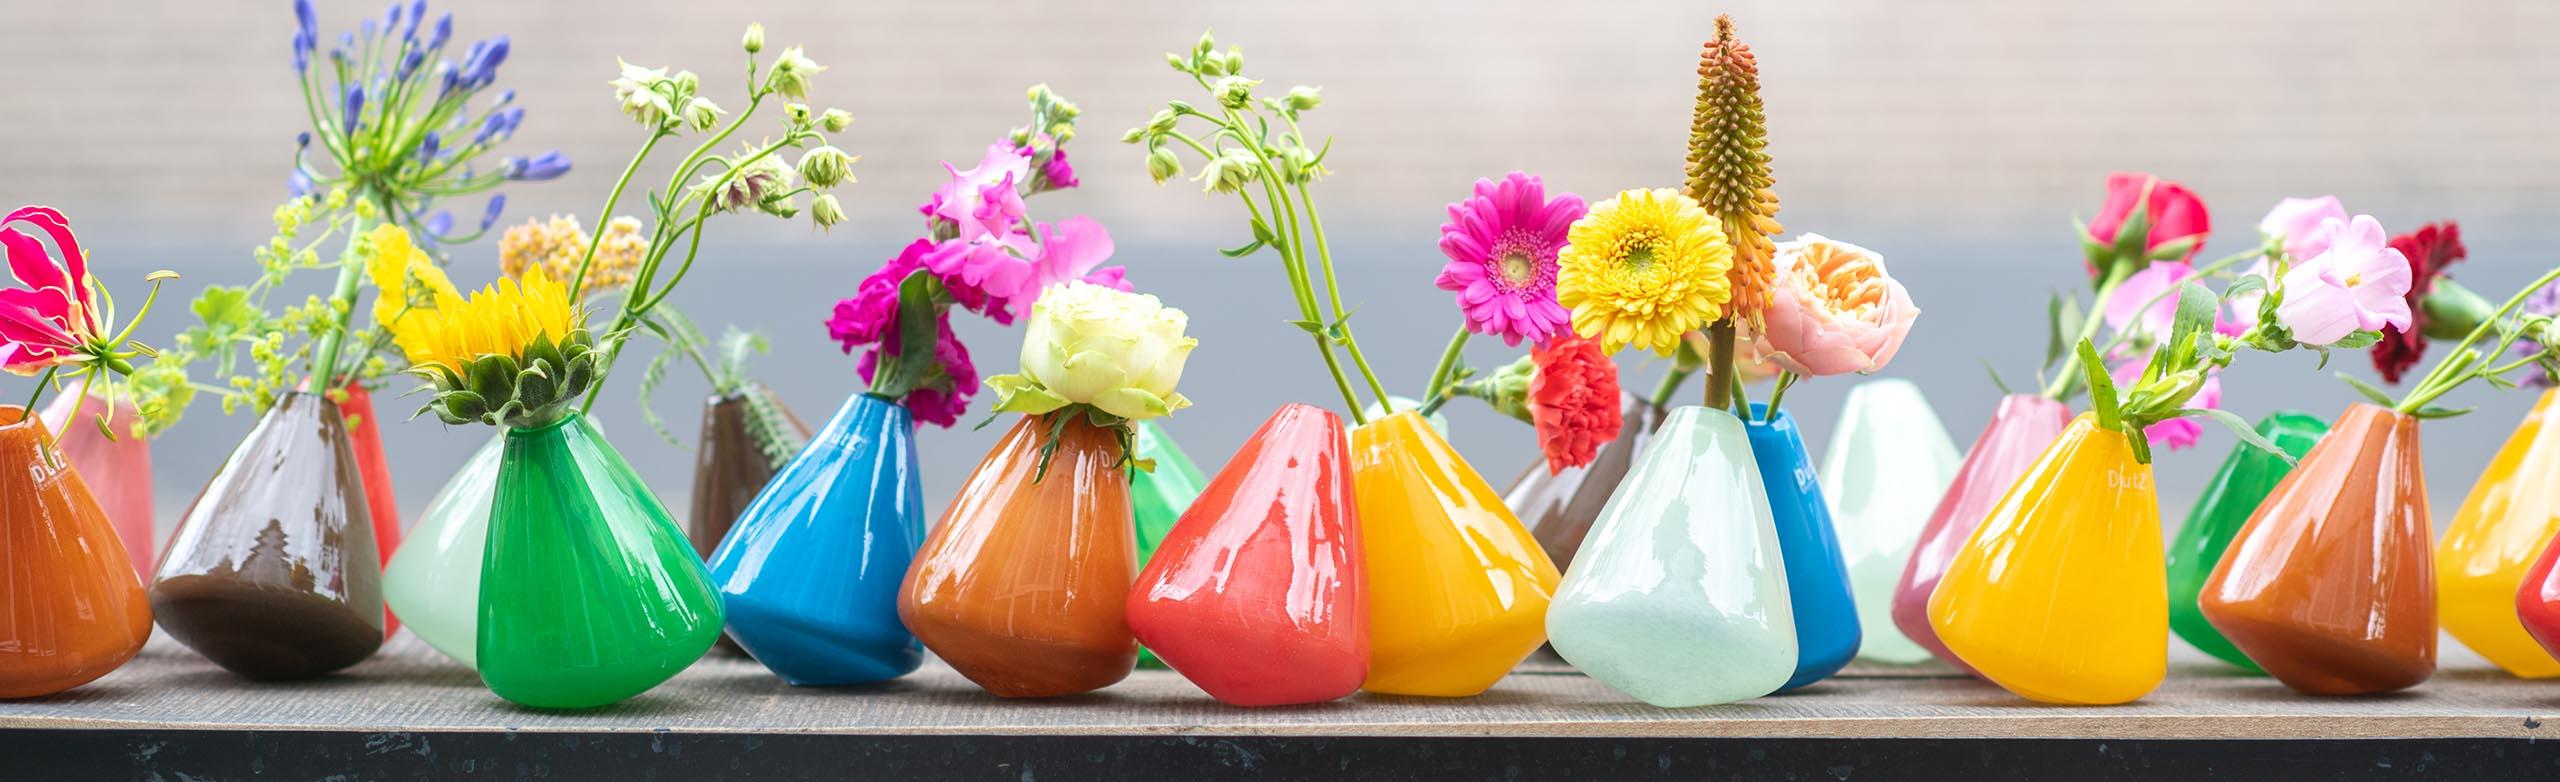 DutZ tumbling vases